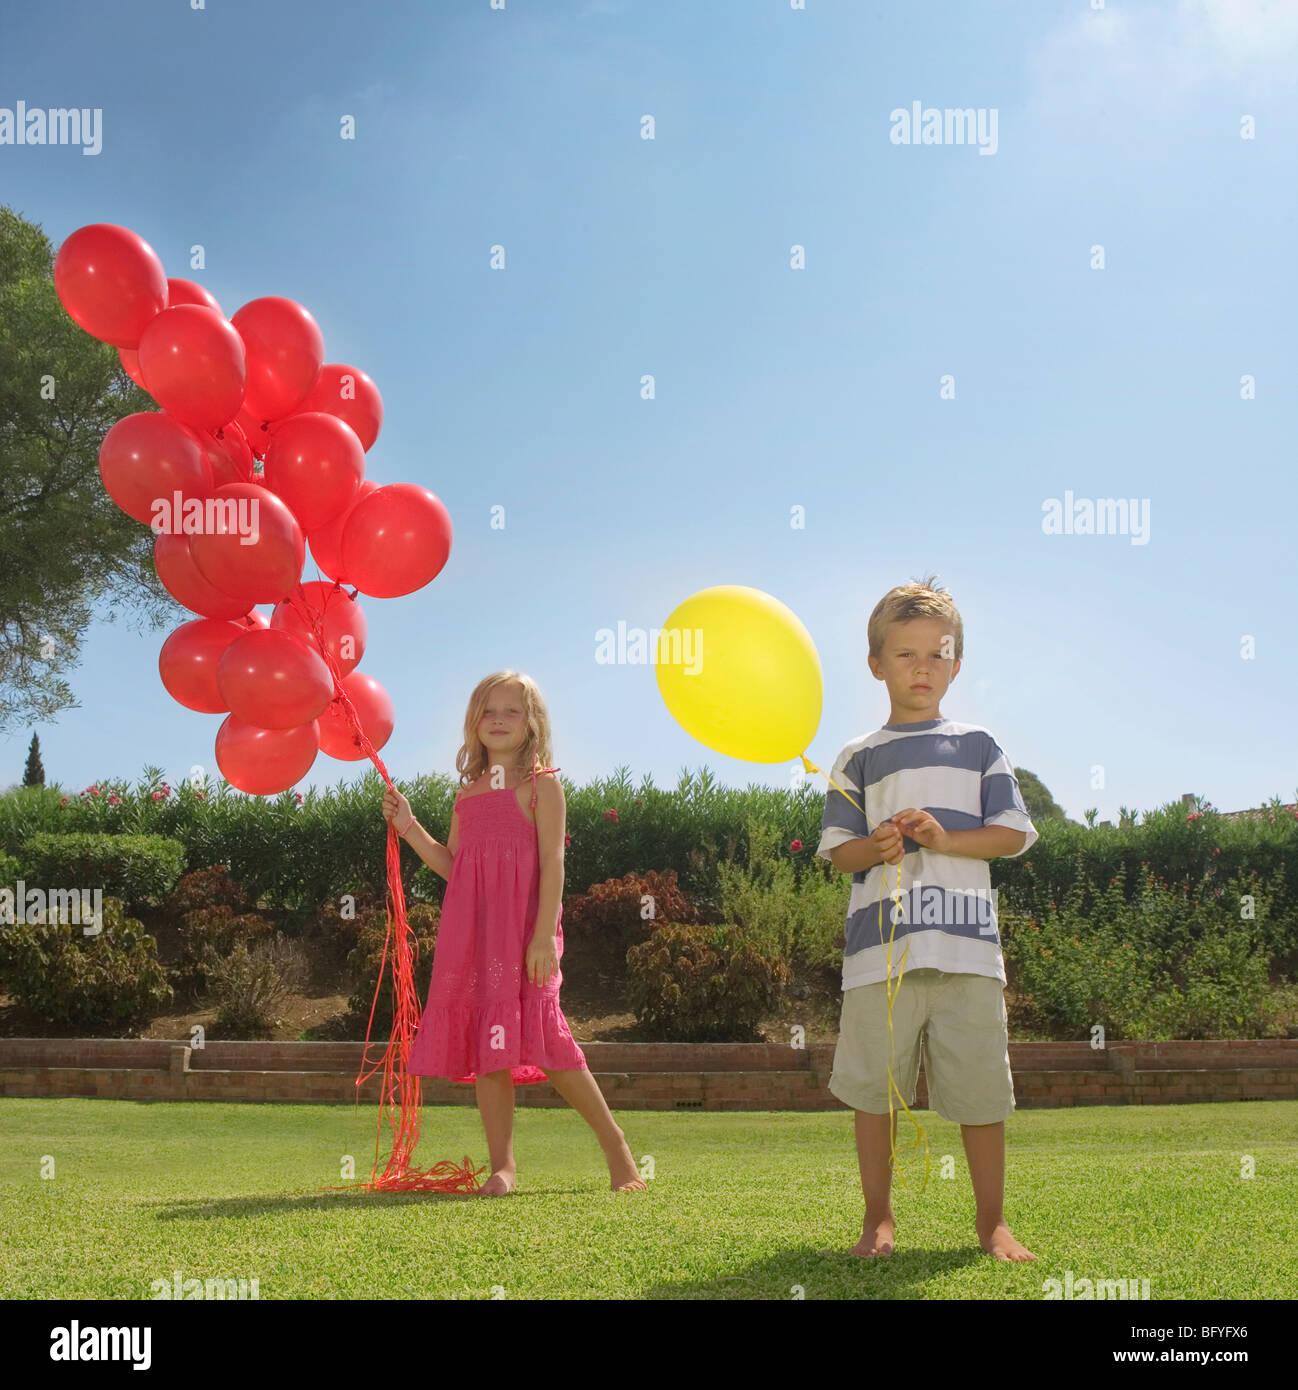 Kleine Kinder halten rote Luftballons Stockbild